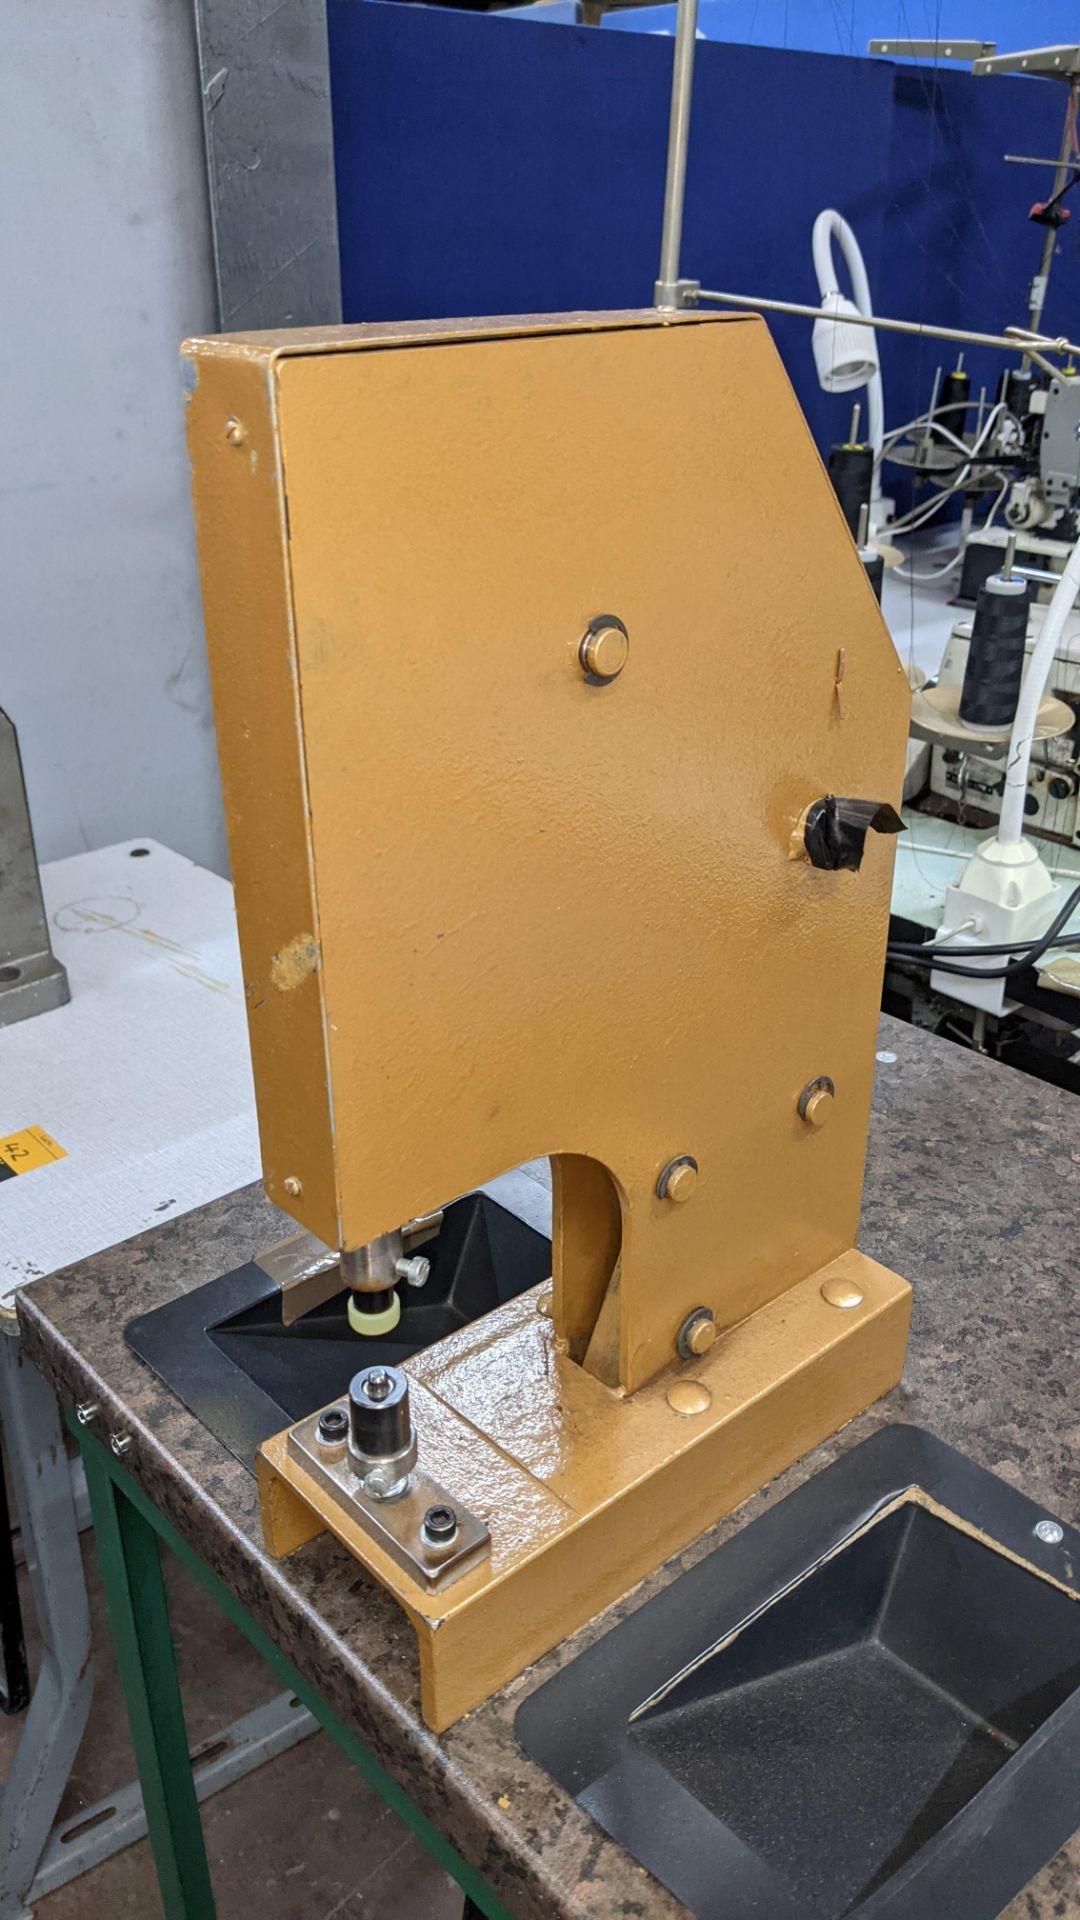 Foot operated riveting machine/press stud machine - Image 3 of 9